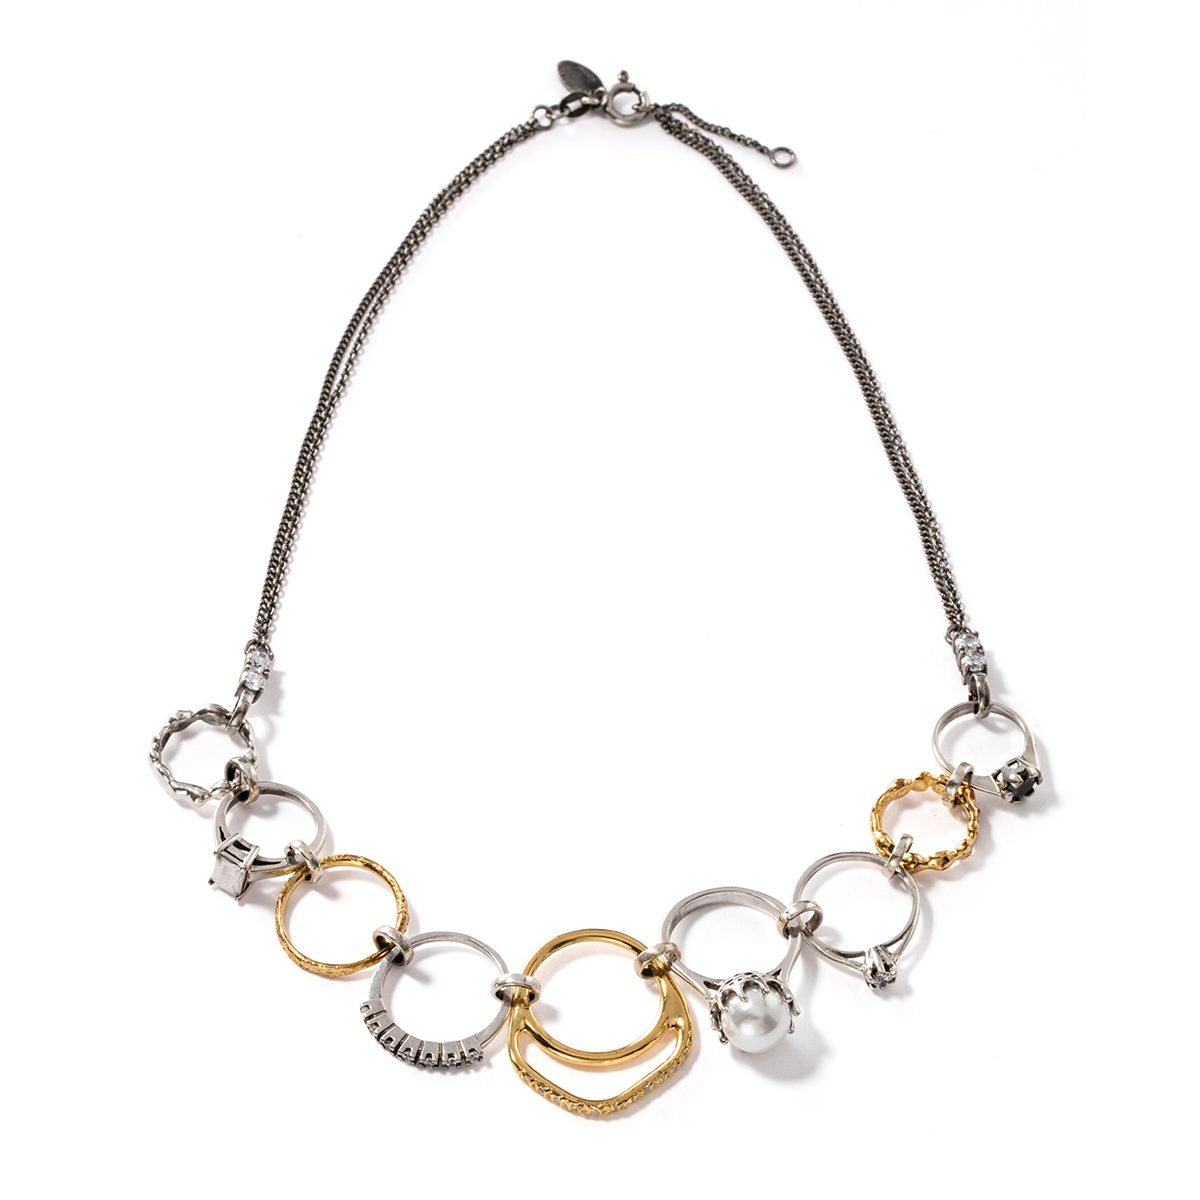 IOSSELLIANI - Classic Collection-CATENA|Necklaces